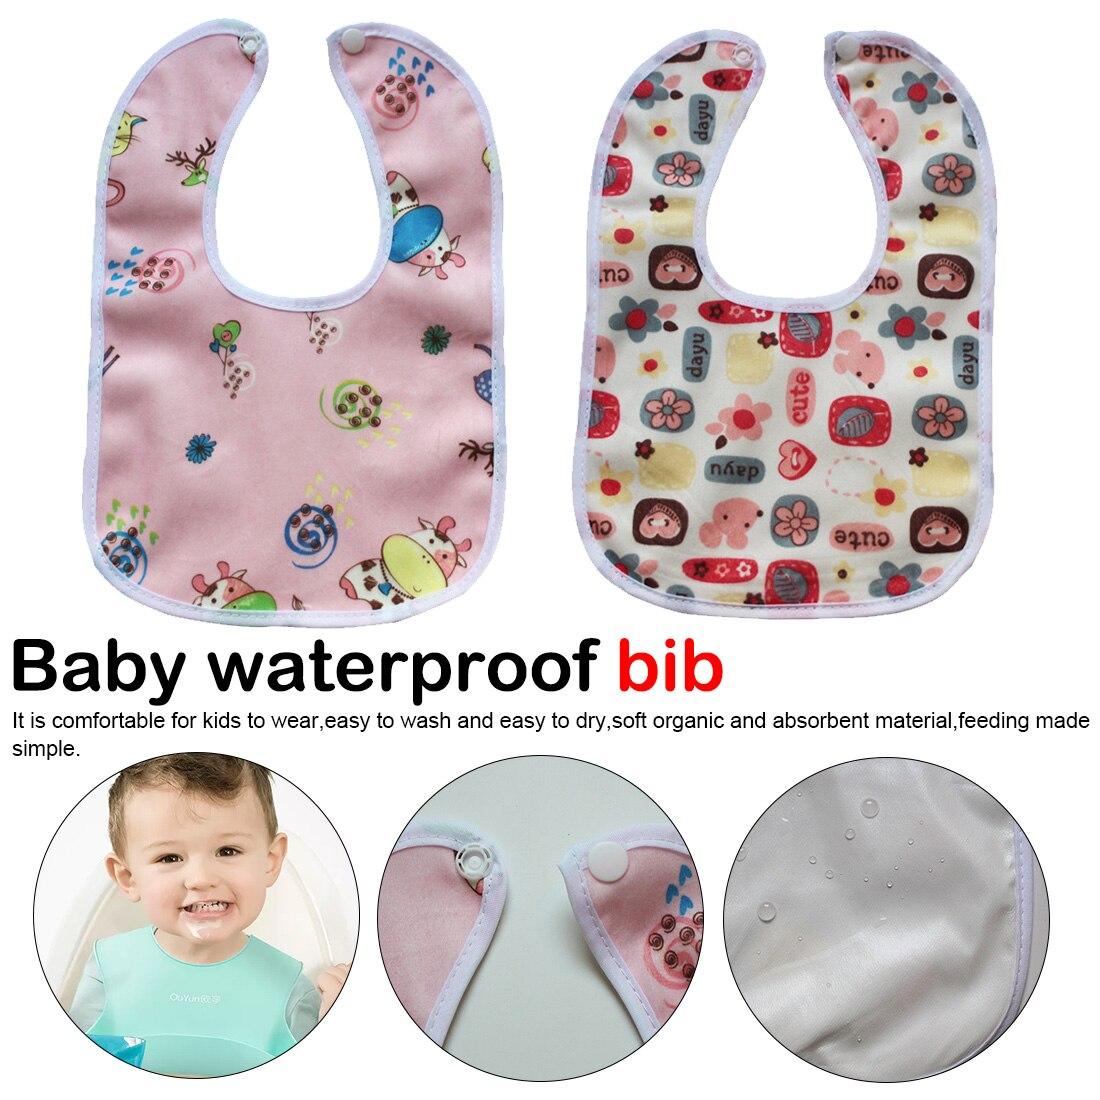 Baby Girl Boy Waterproof Cartoon Soft Towel Kids Toddler Dinner Feeding Bibs